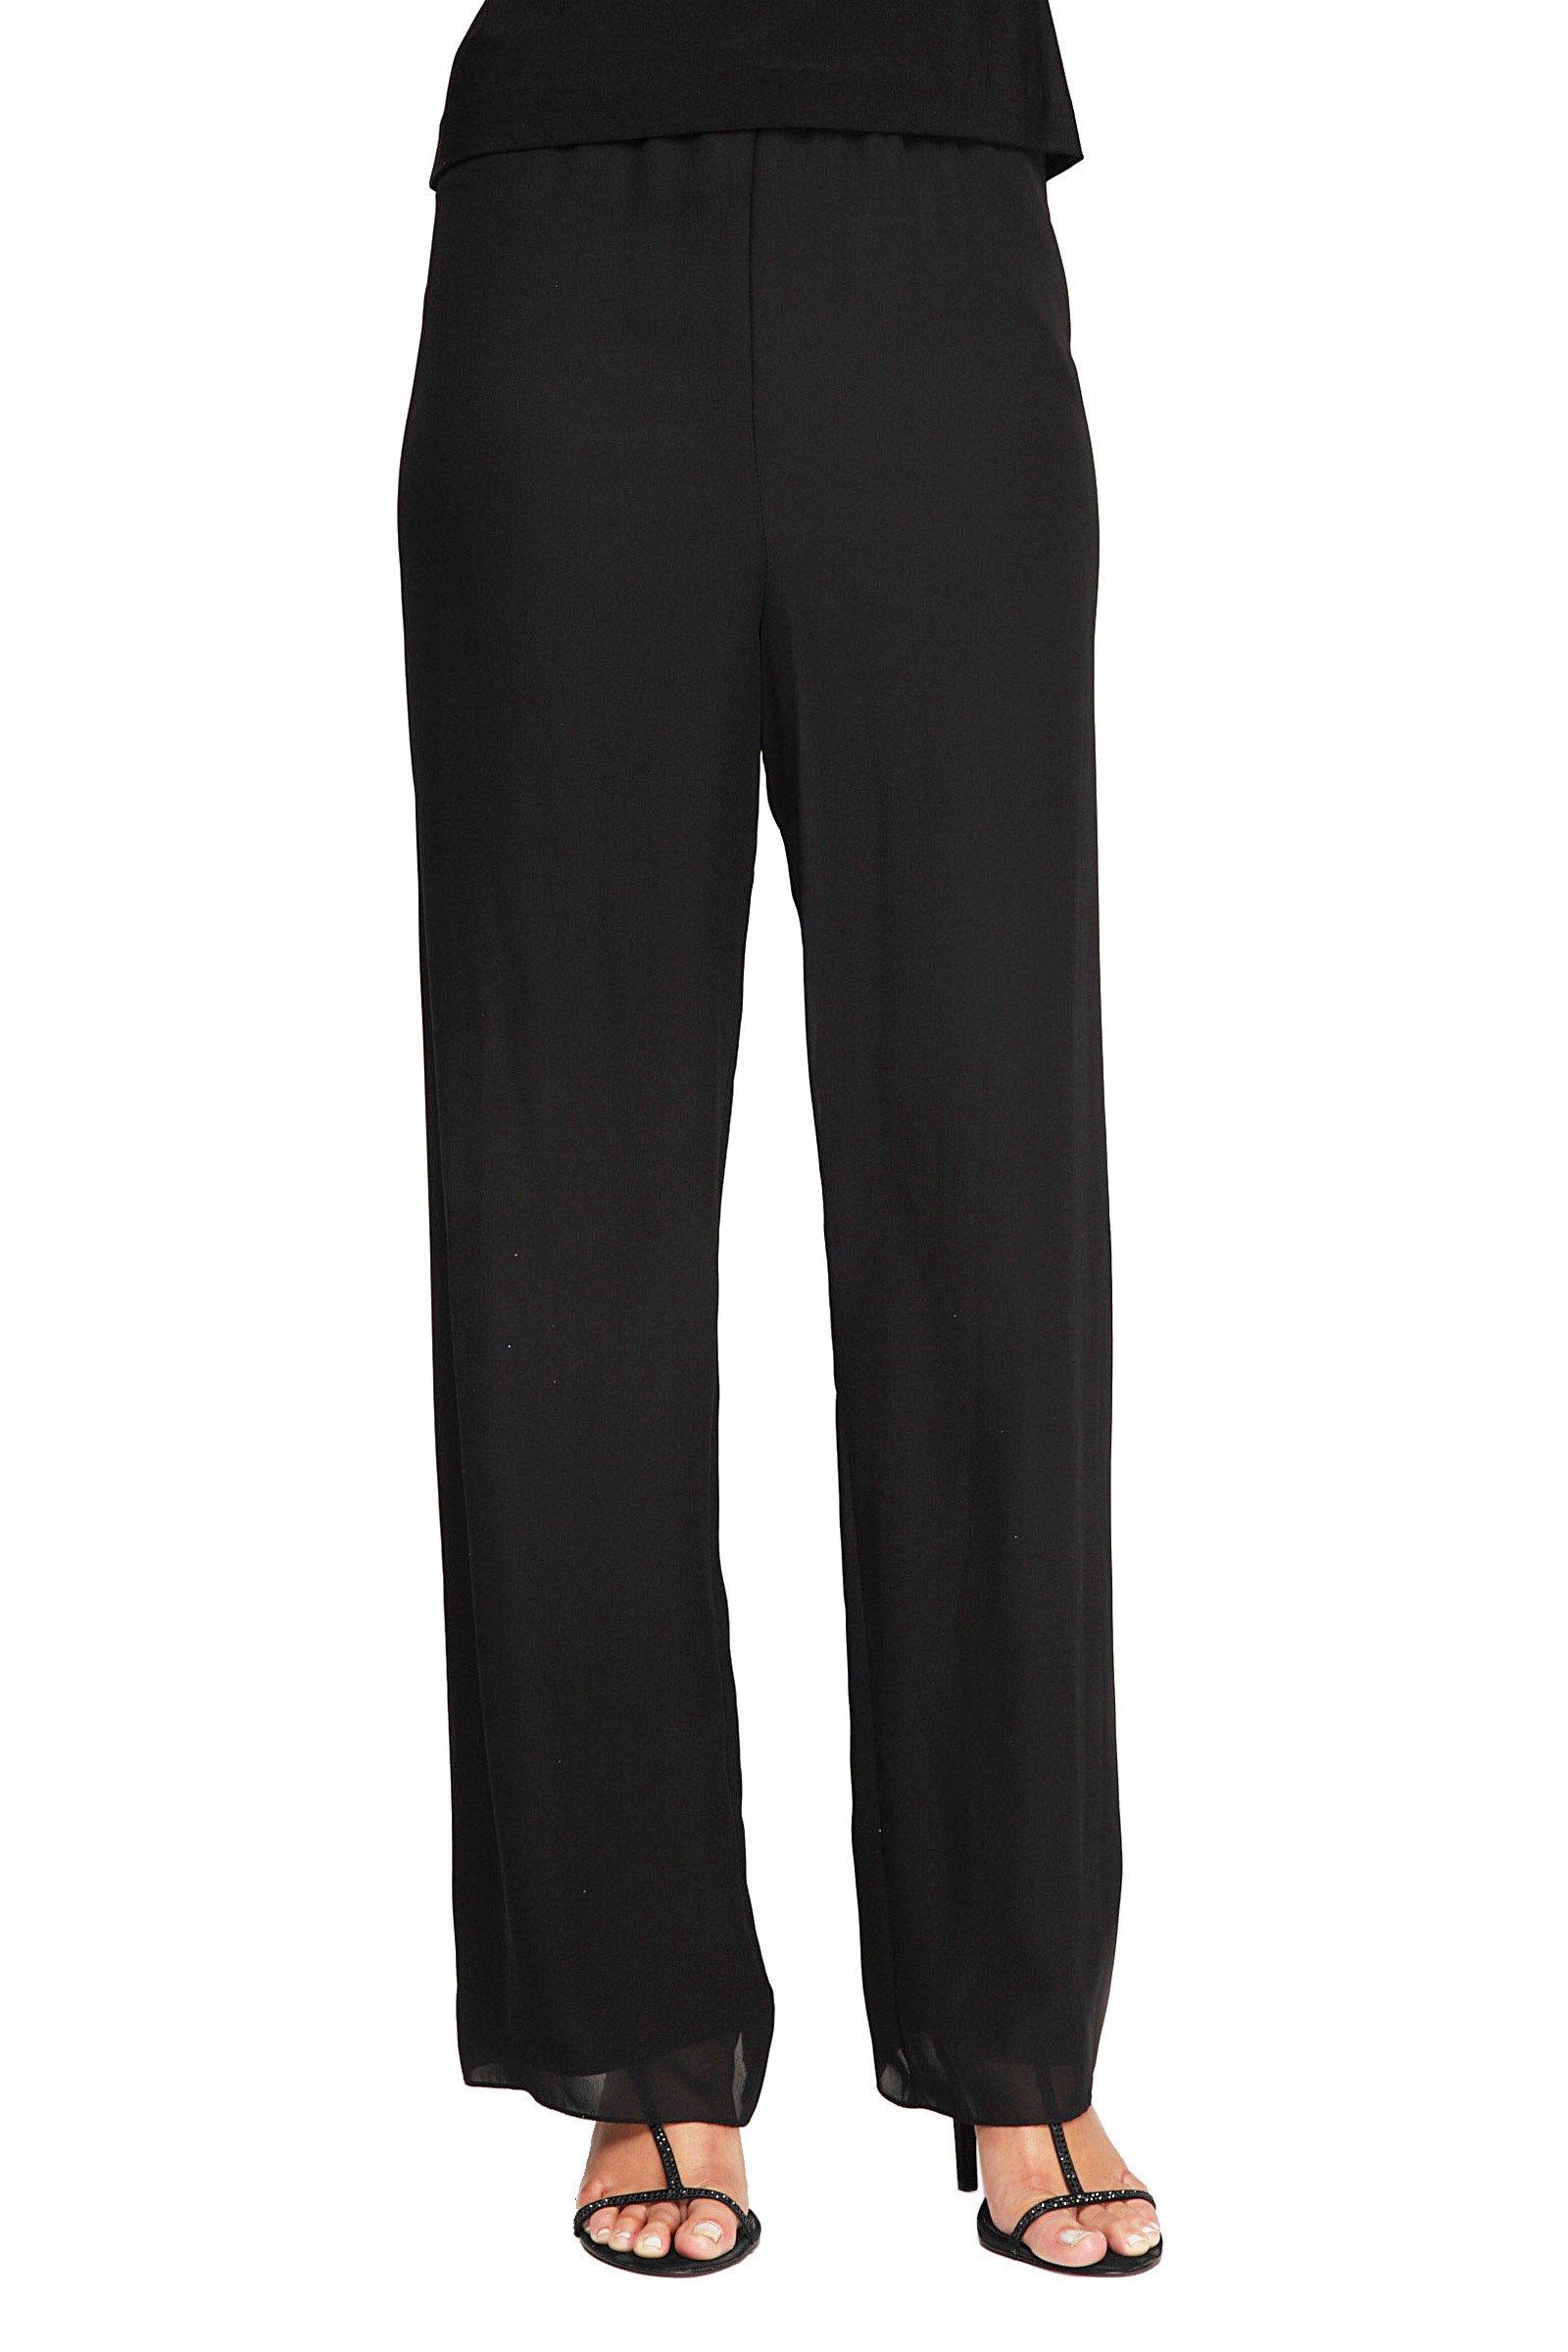 Alex Evenings Women's Plus-Size Chiffon Dress Pant, Black, 3X